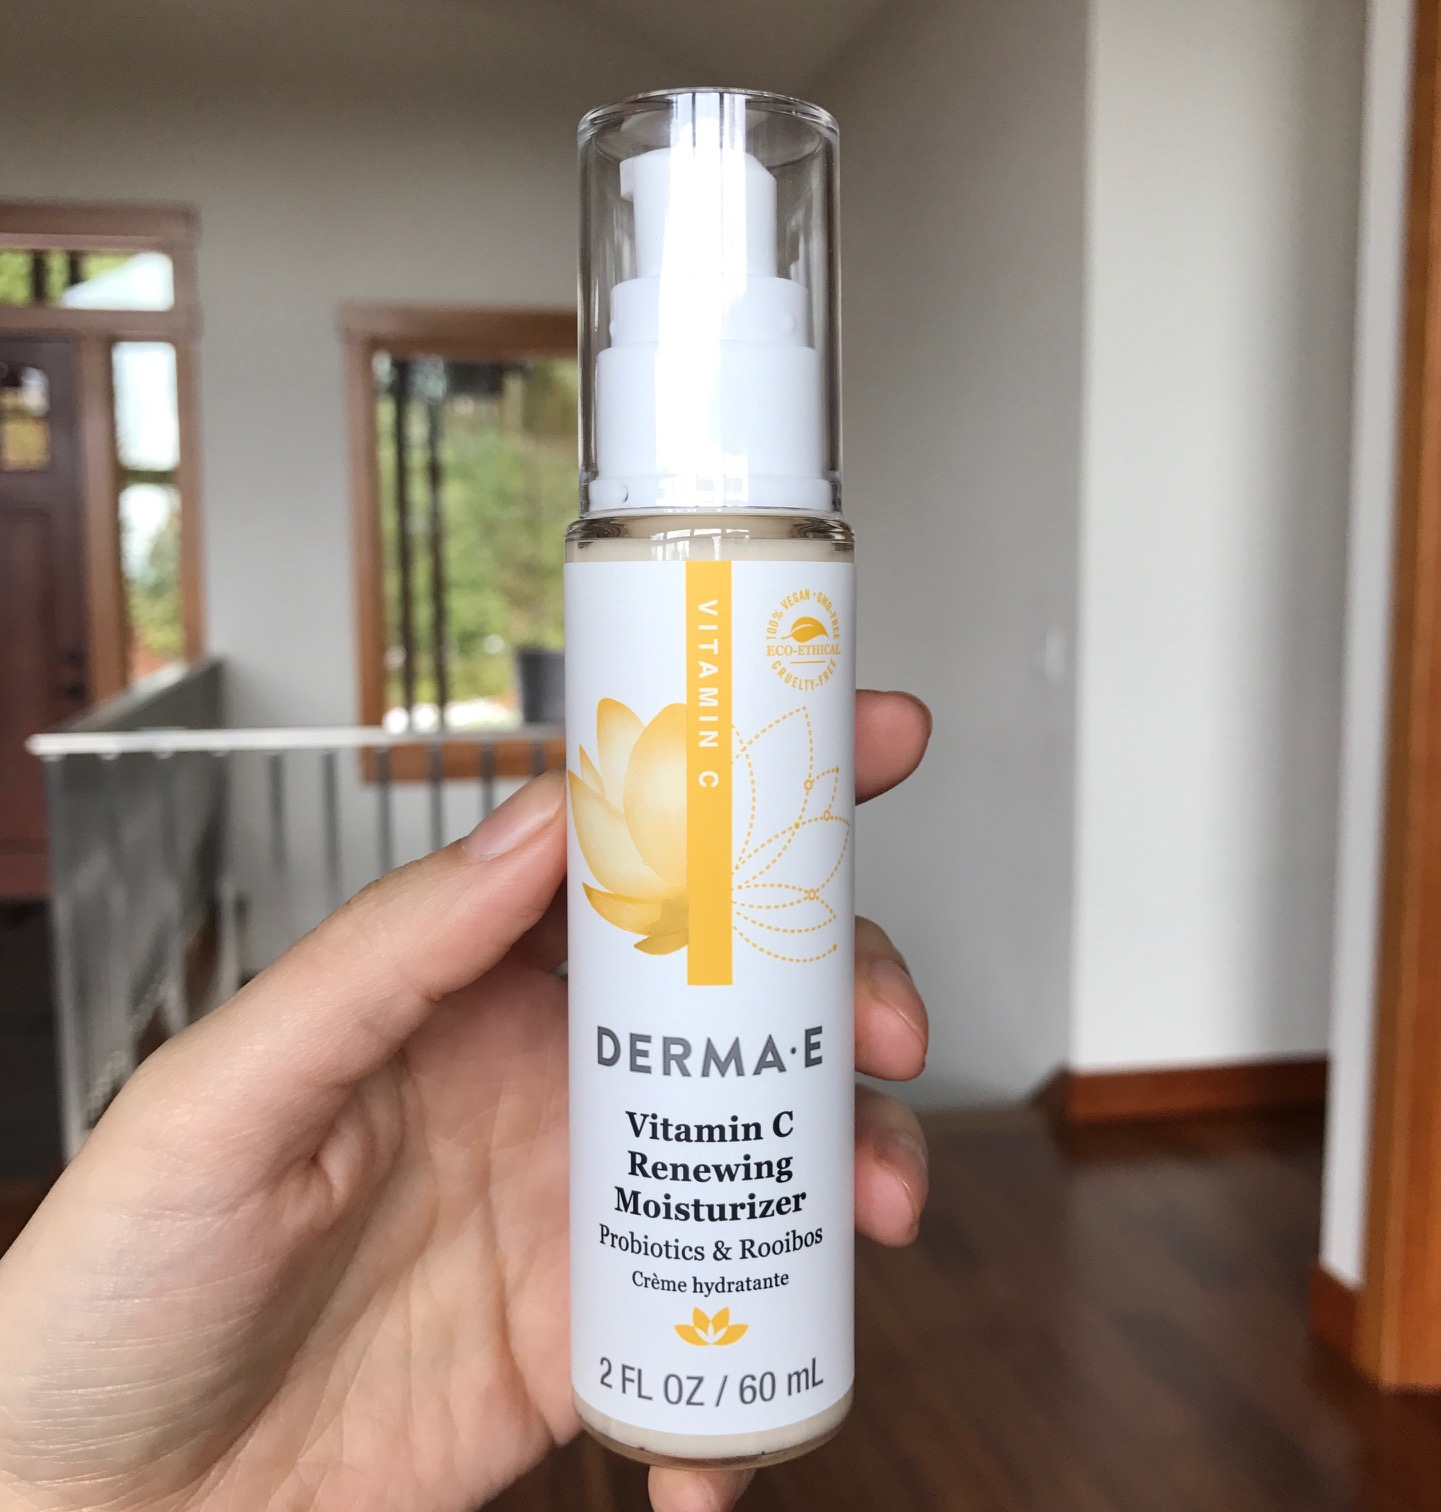 Derma e renewing moisturizer